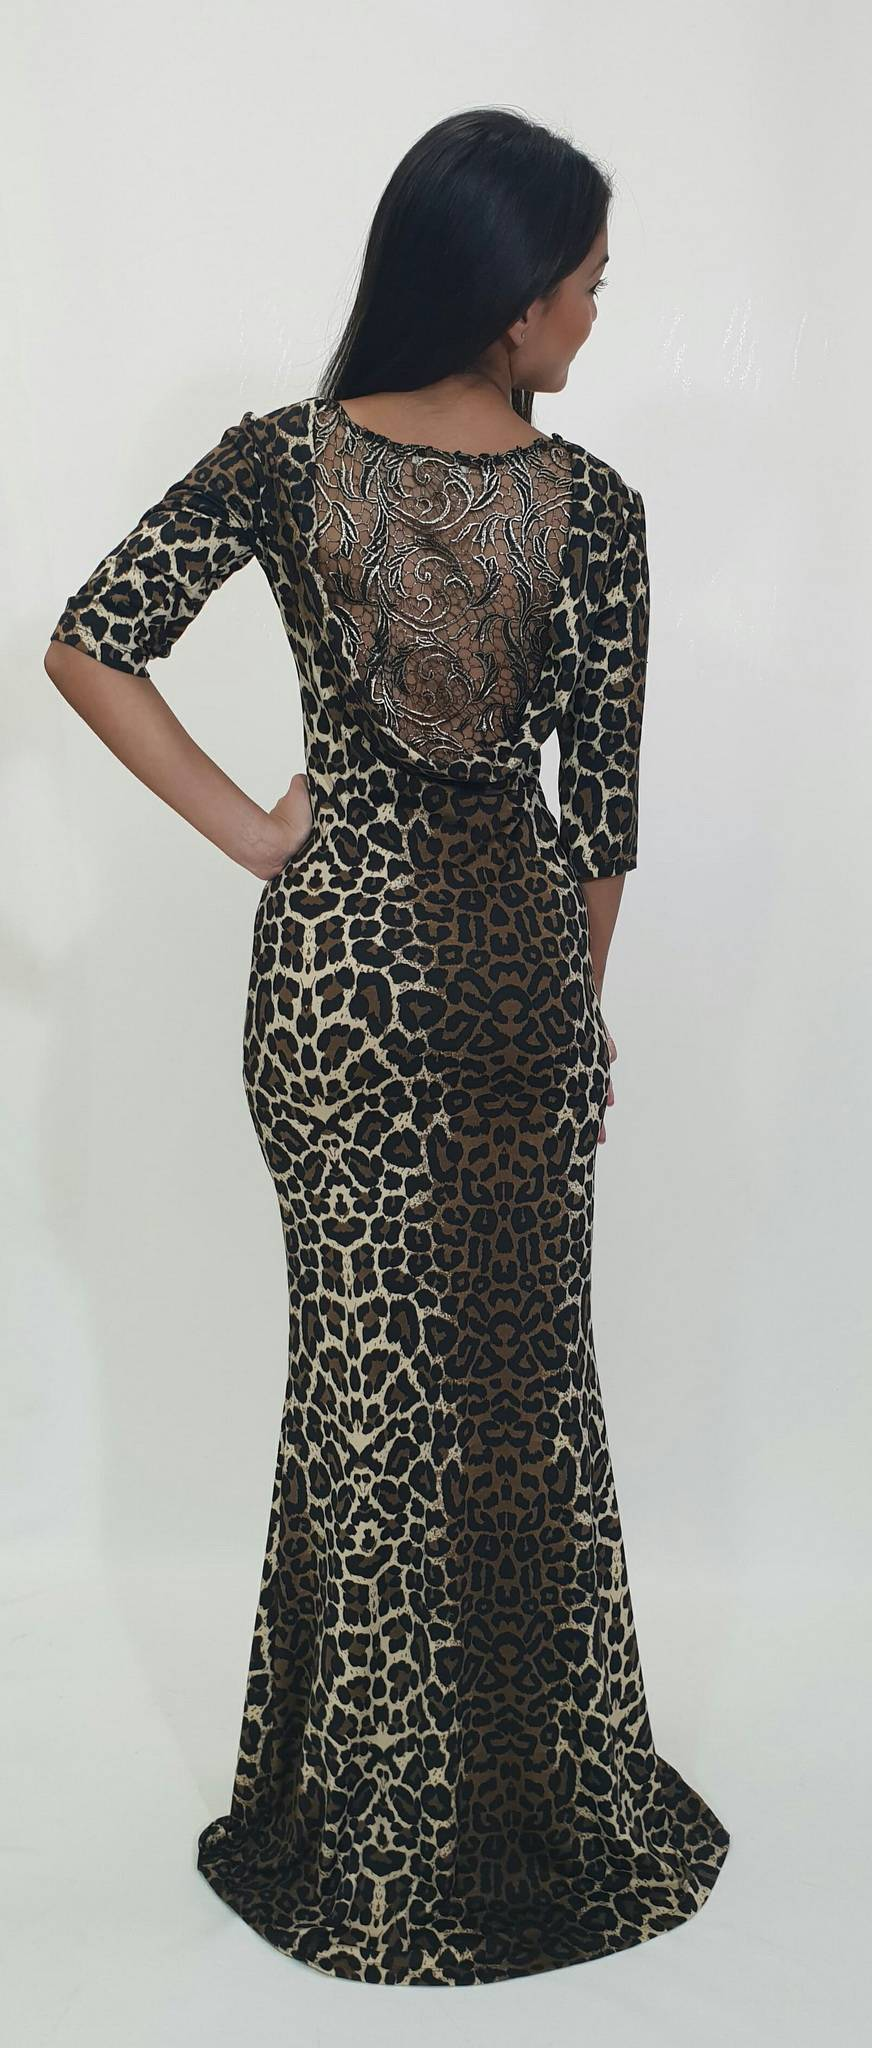 1add00a93138 Φόρεμα μακρύ με σχέδιο στη πλάτη - For ever Chania Clothing ...